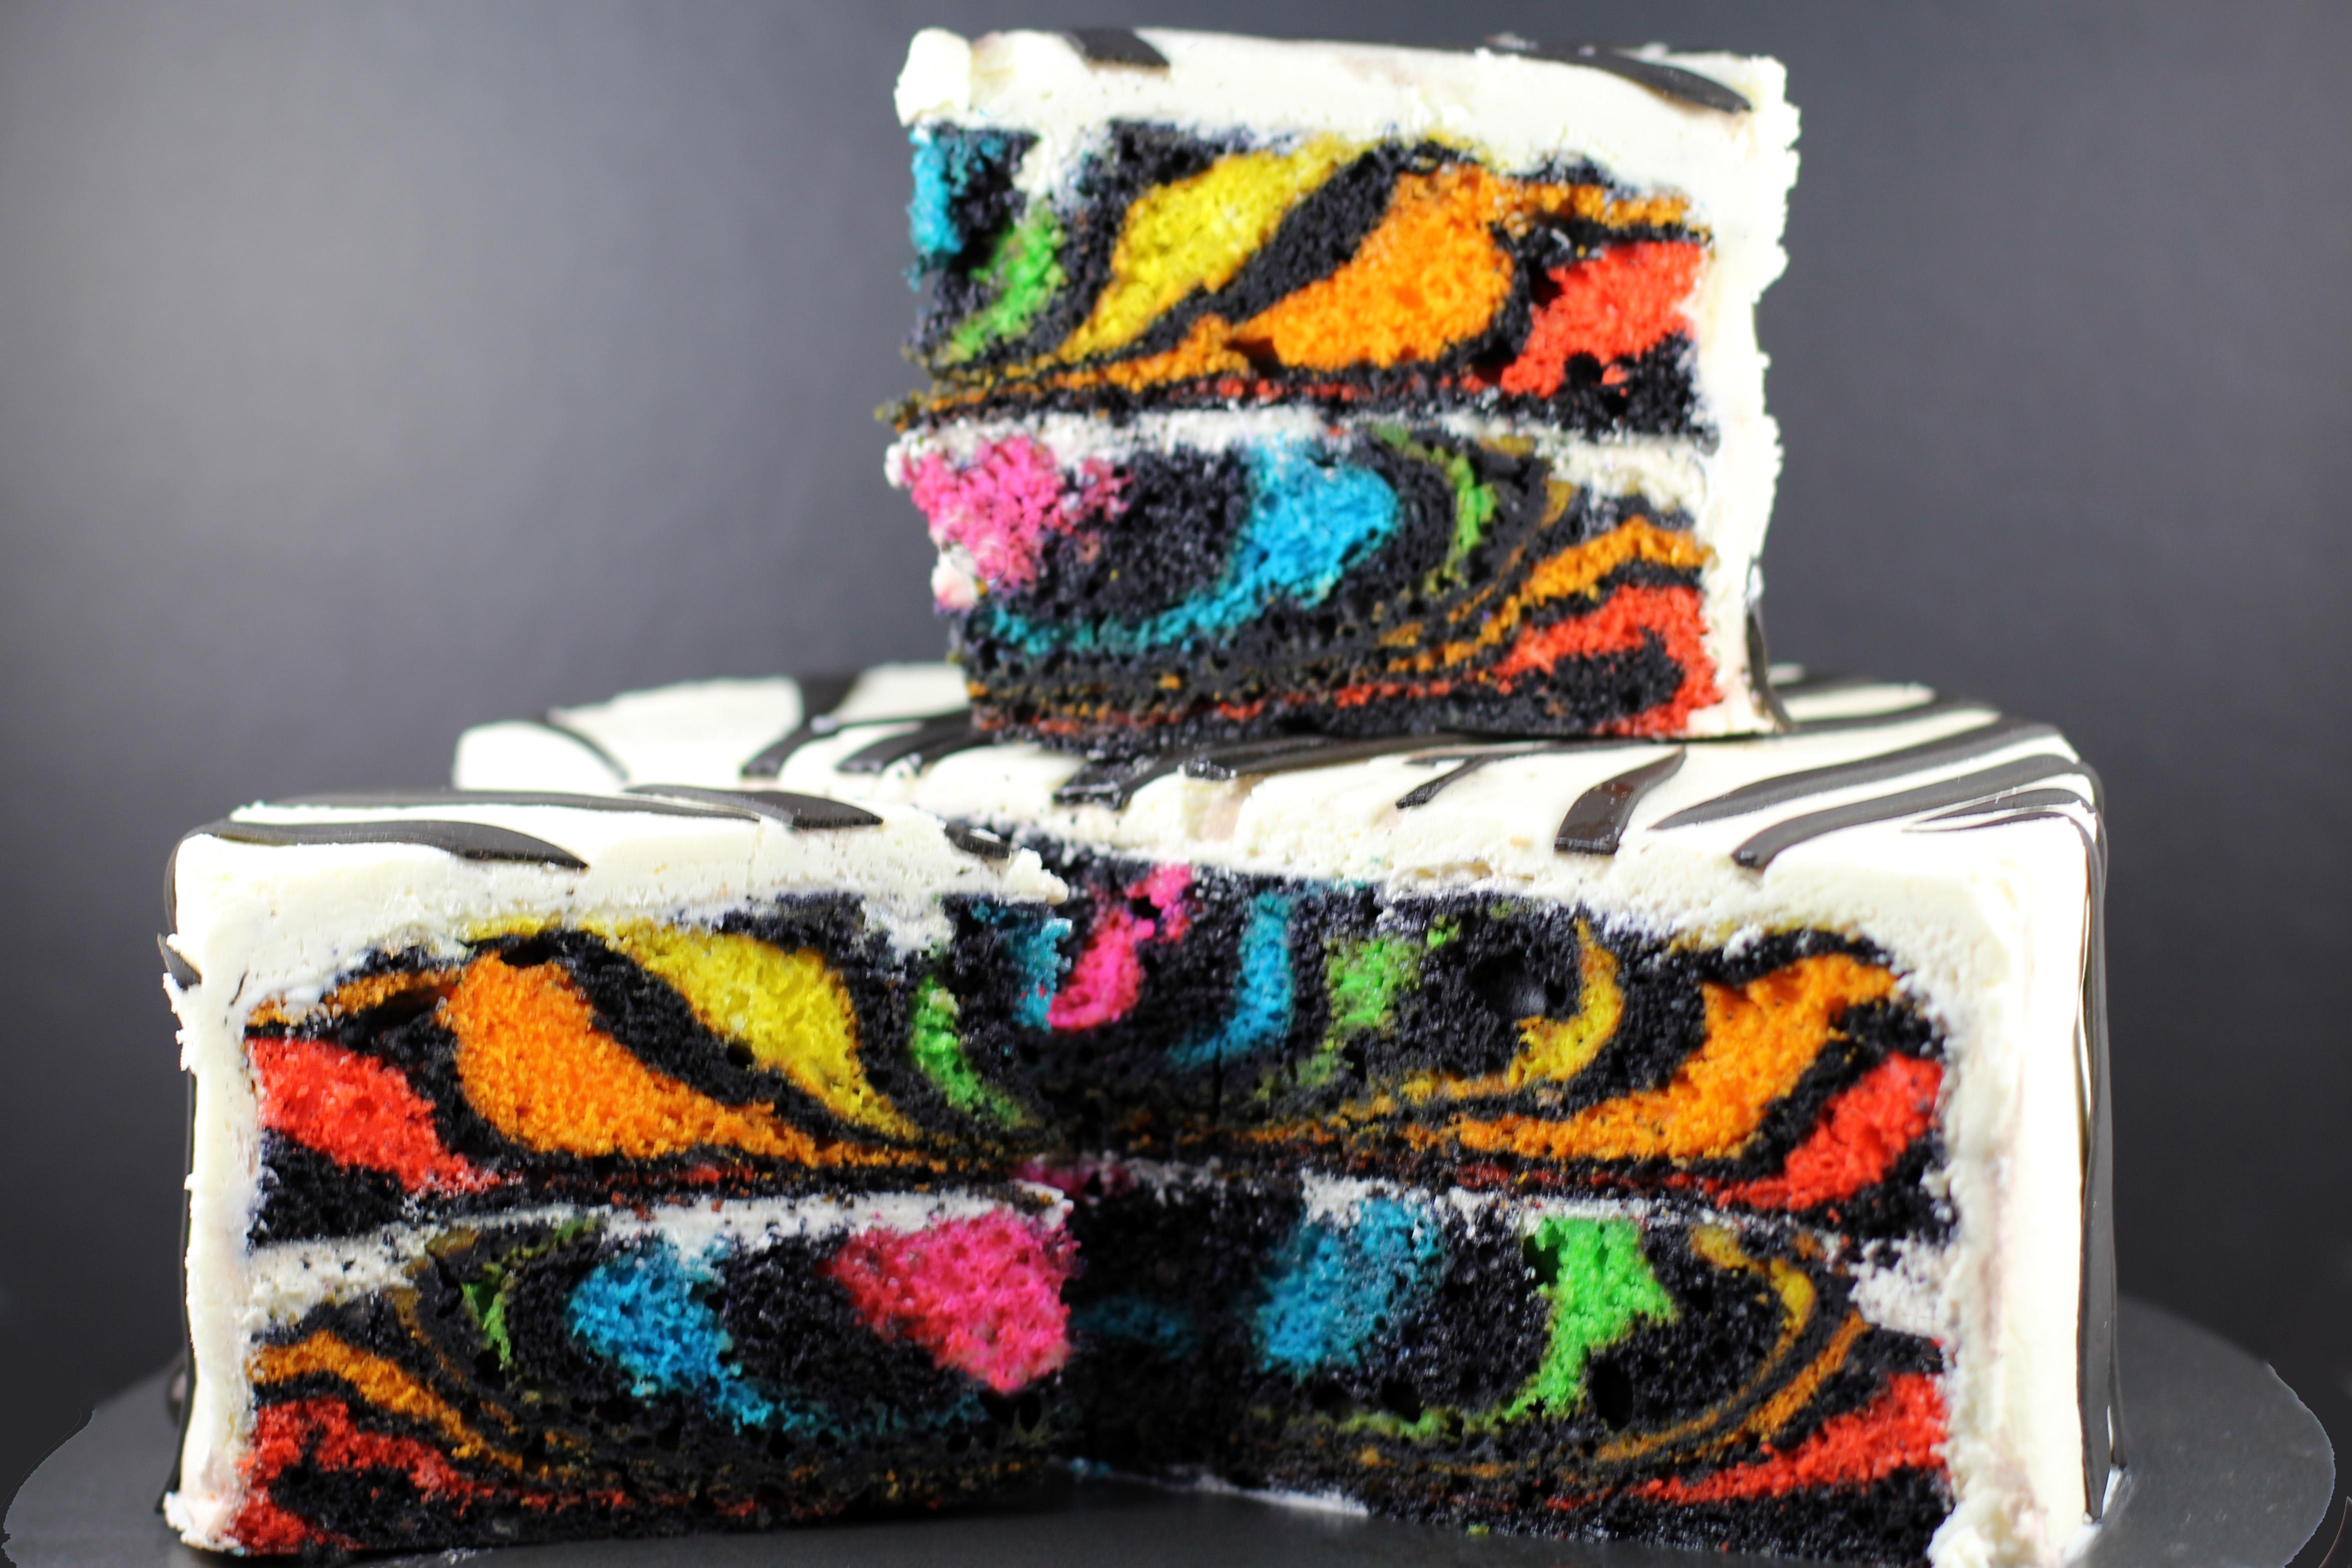 Surprise Inside Rainbow Zebra Cake Zebra cake topper | etsy. surprise inside rainbow zebra cake